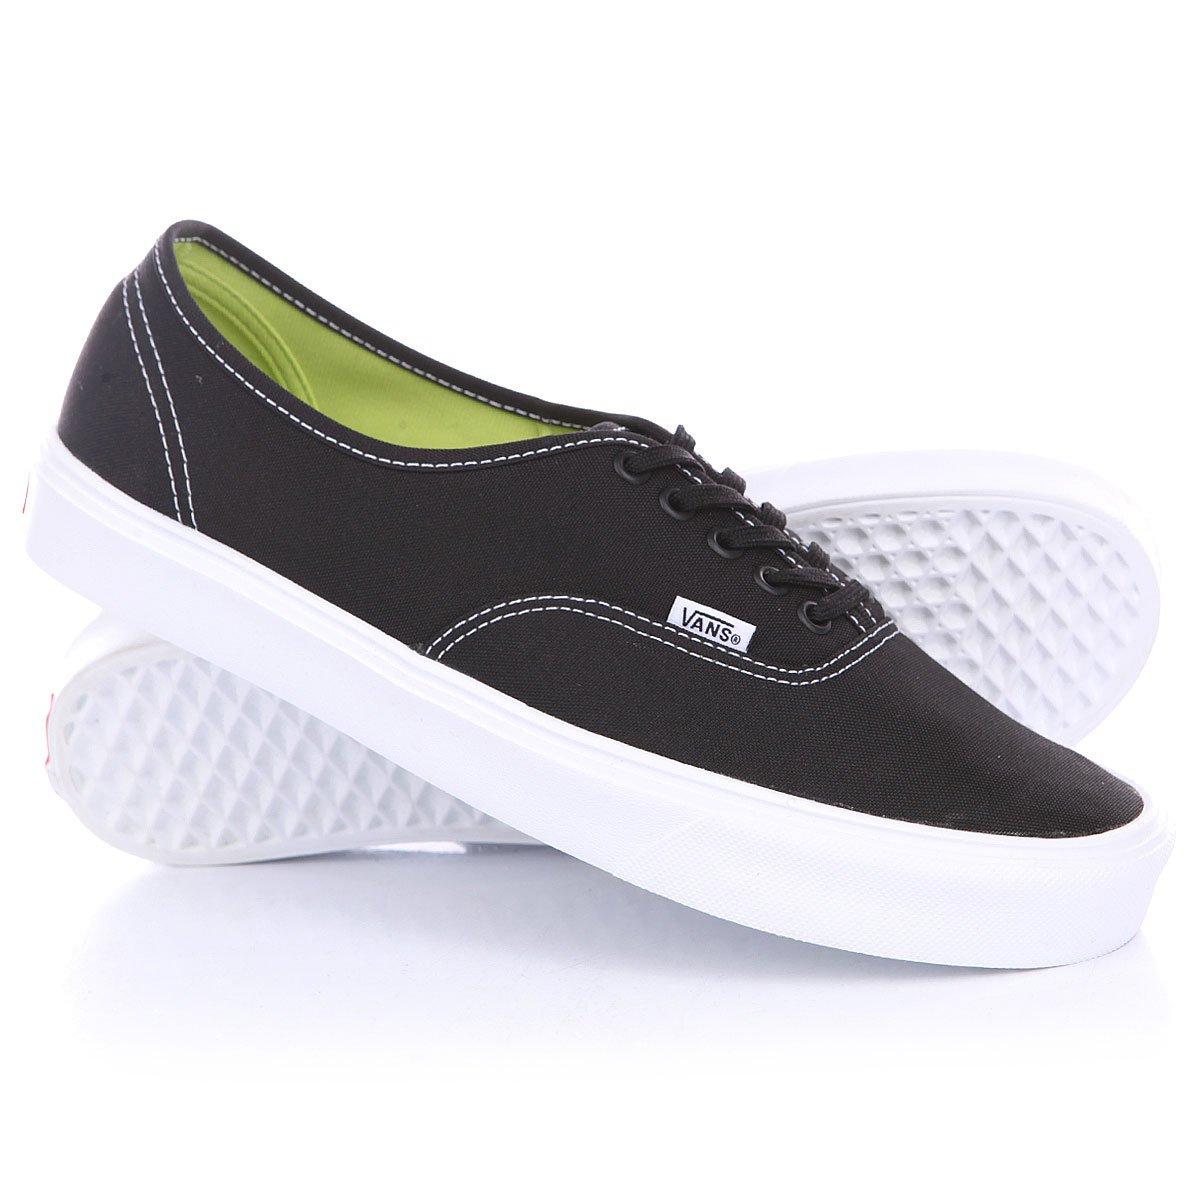 4a2526137619 Купить кеды Vans Authentic Lite Black True White в интернет-магазине  Proskater.kz